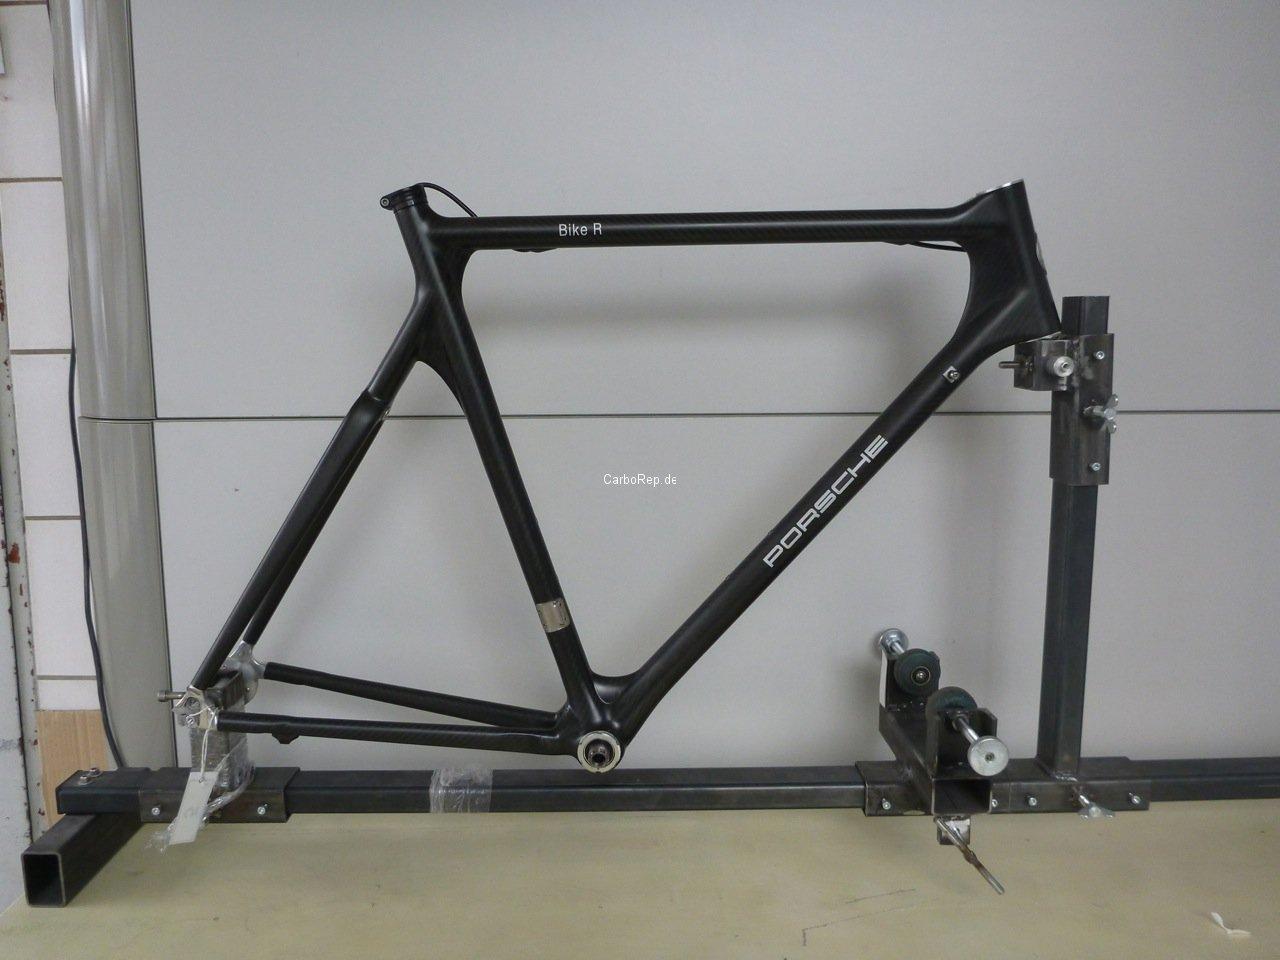 Carbon_Rahmen_Reparatur_Storck_Porsche_BikeR1